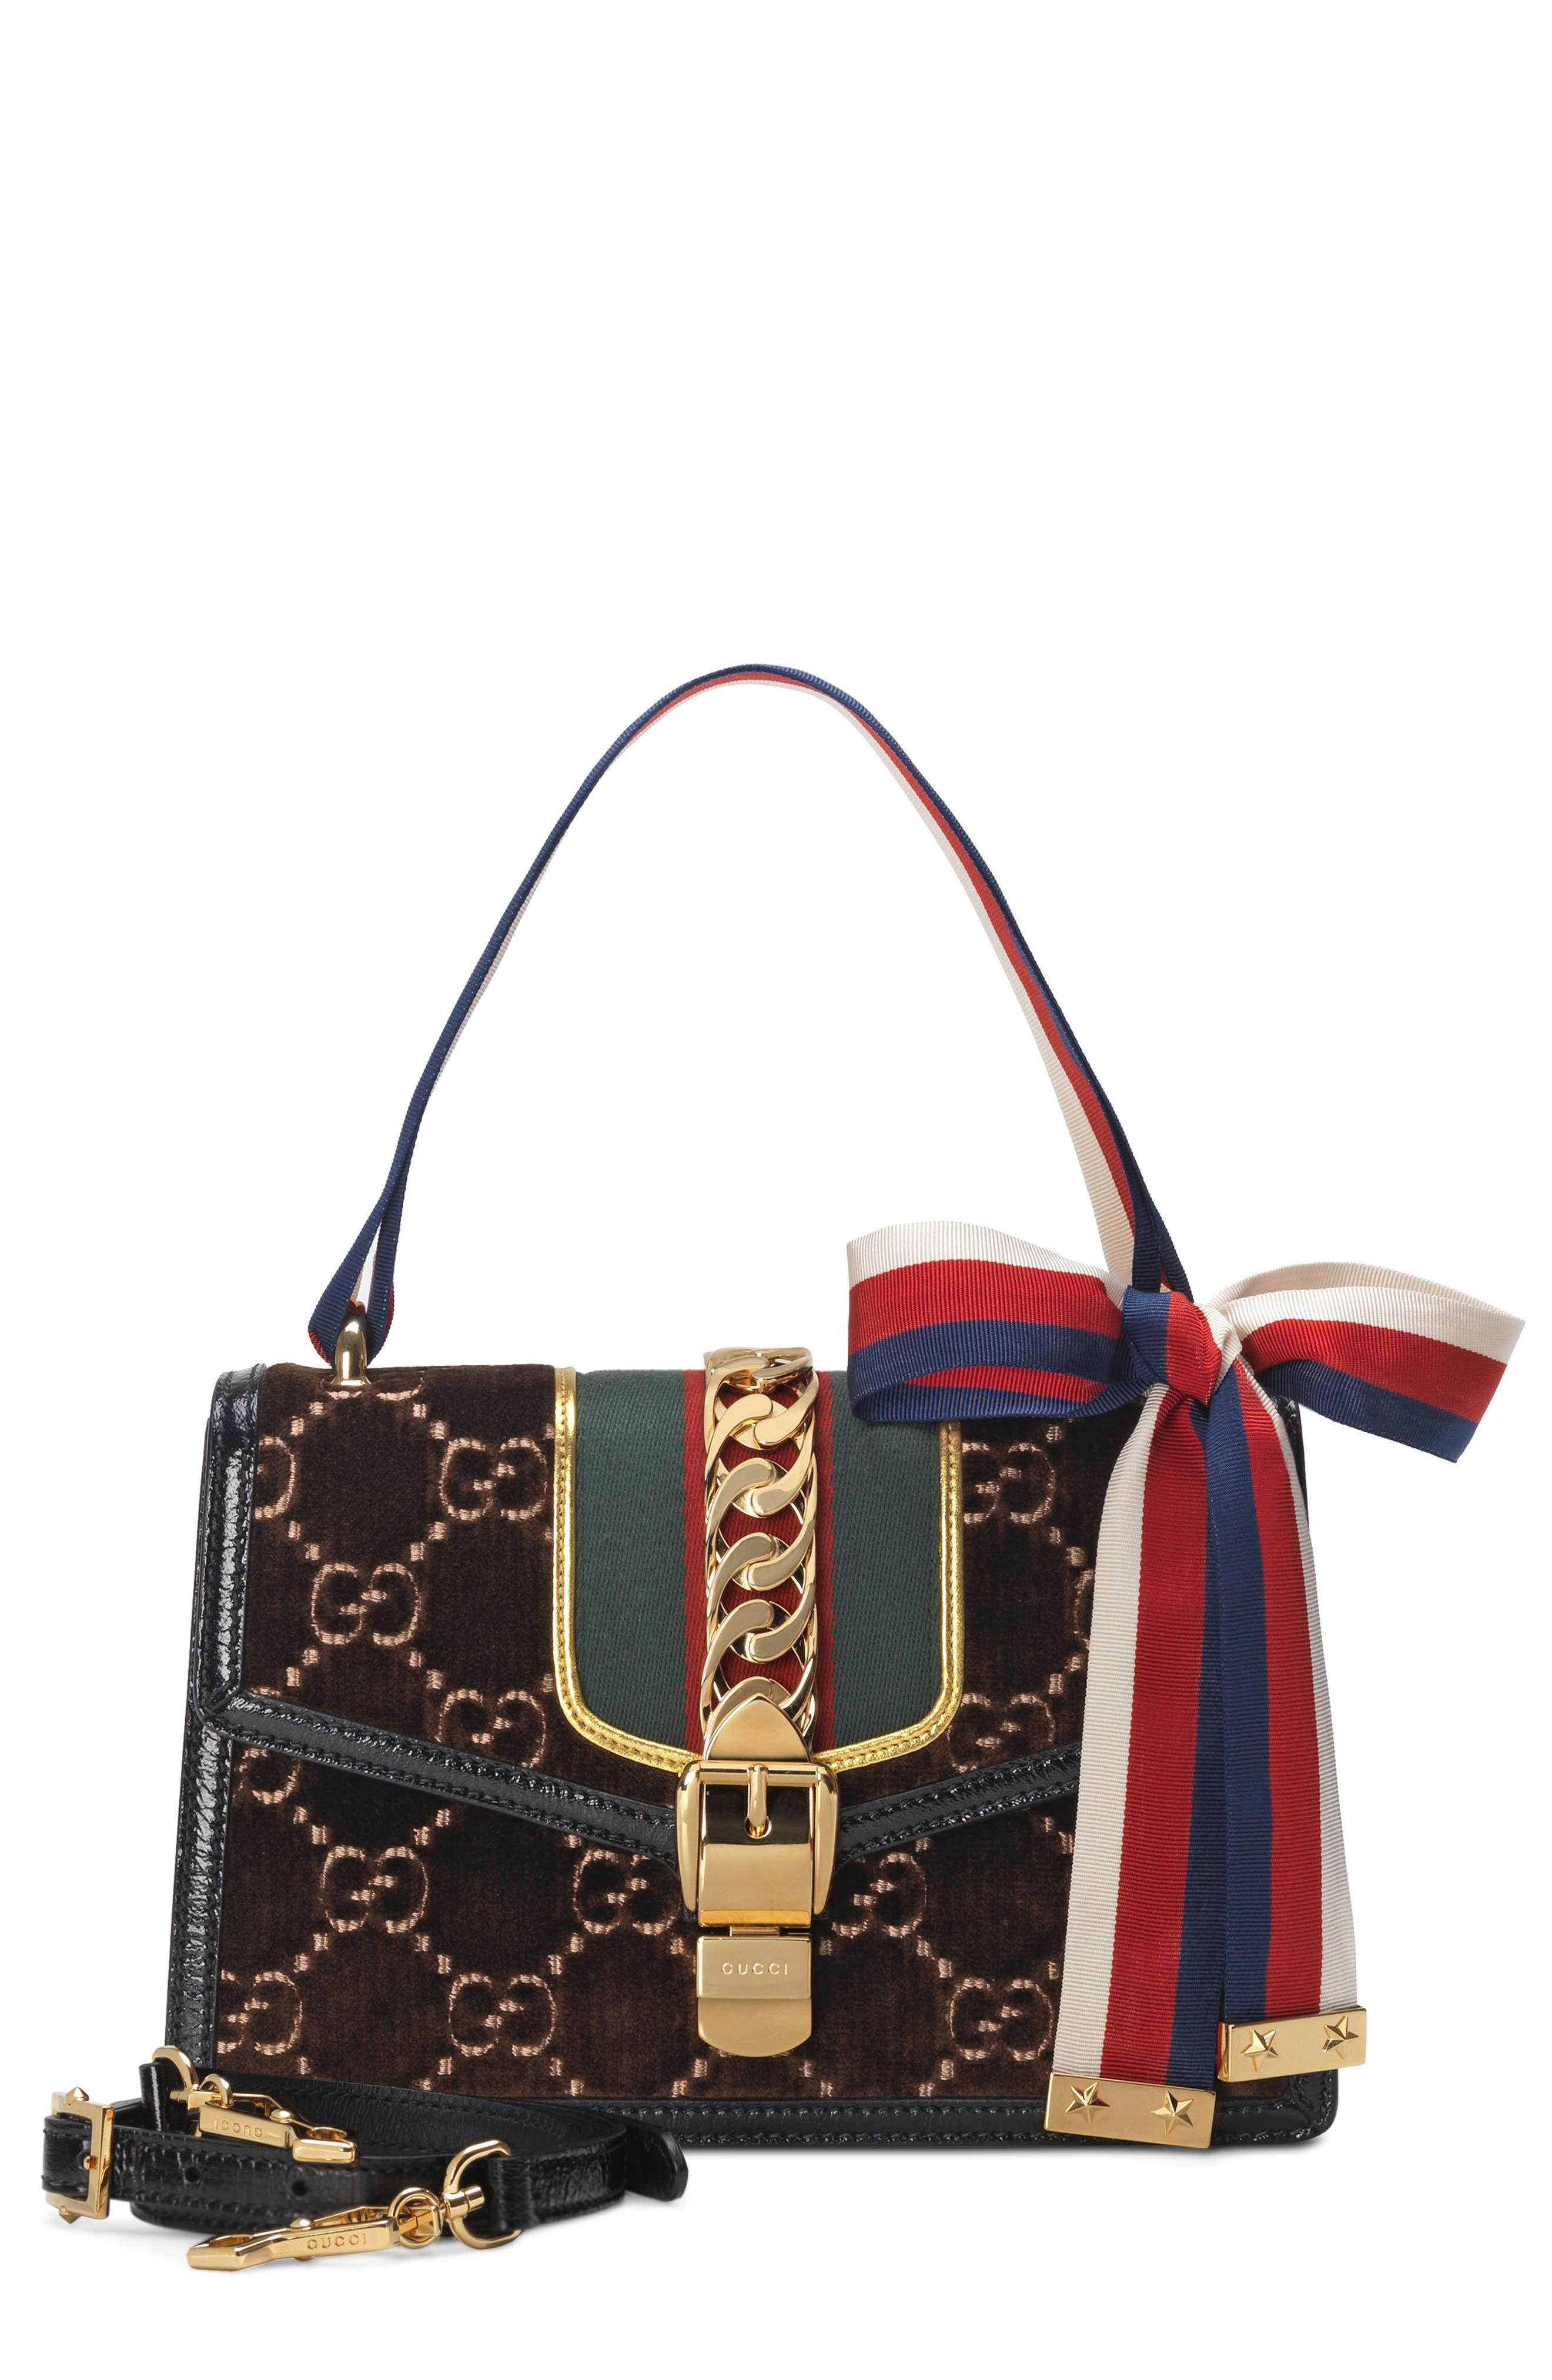 Small Sylvie Velvet Shoulder Bag,                         Main,                         color, BROWN/ NERO/ VERT RED